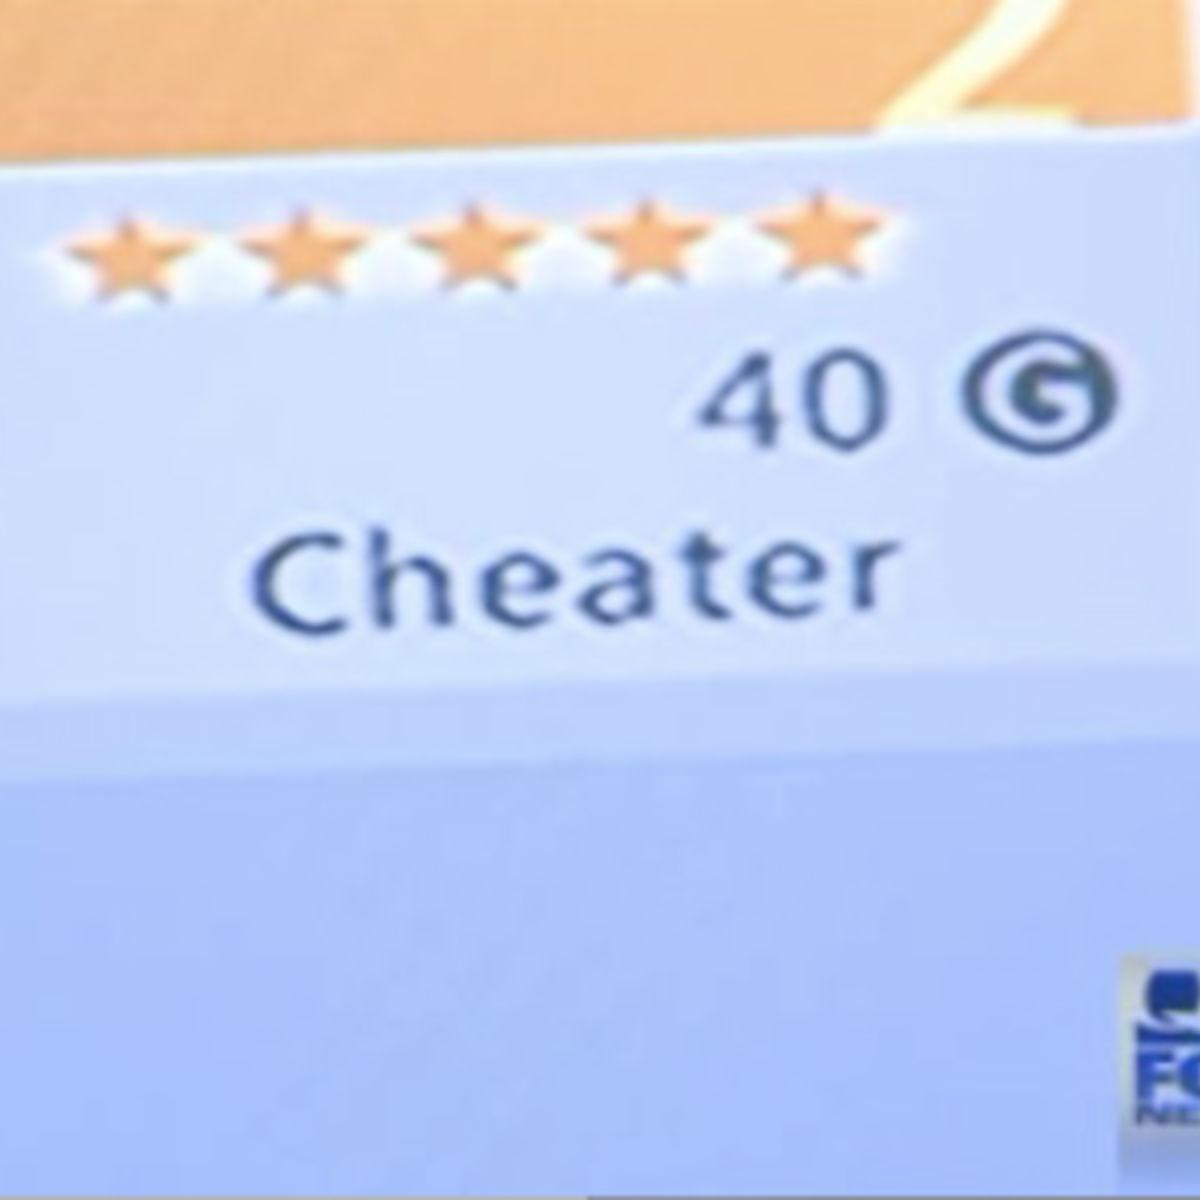 Cheater012611.jpg